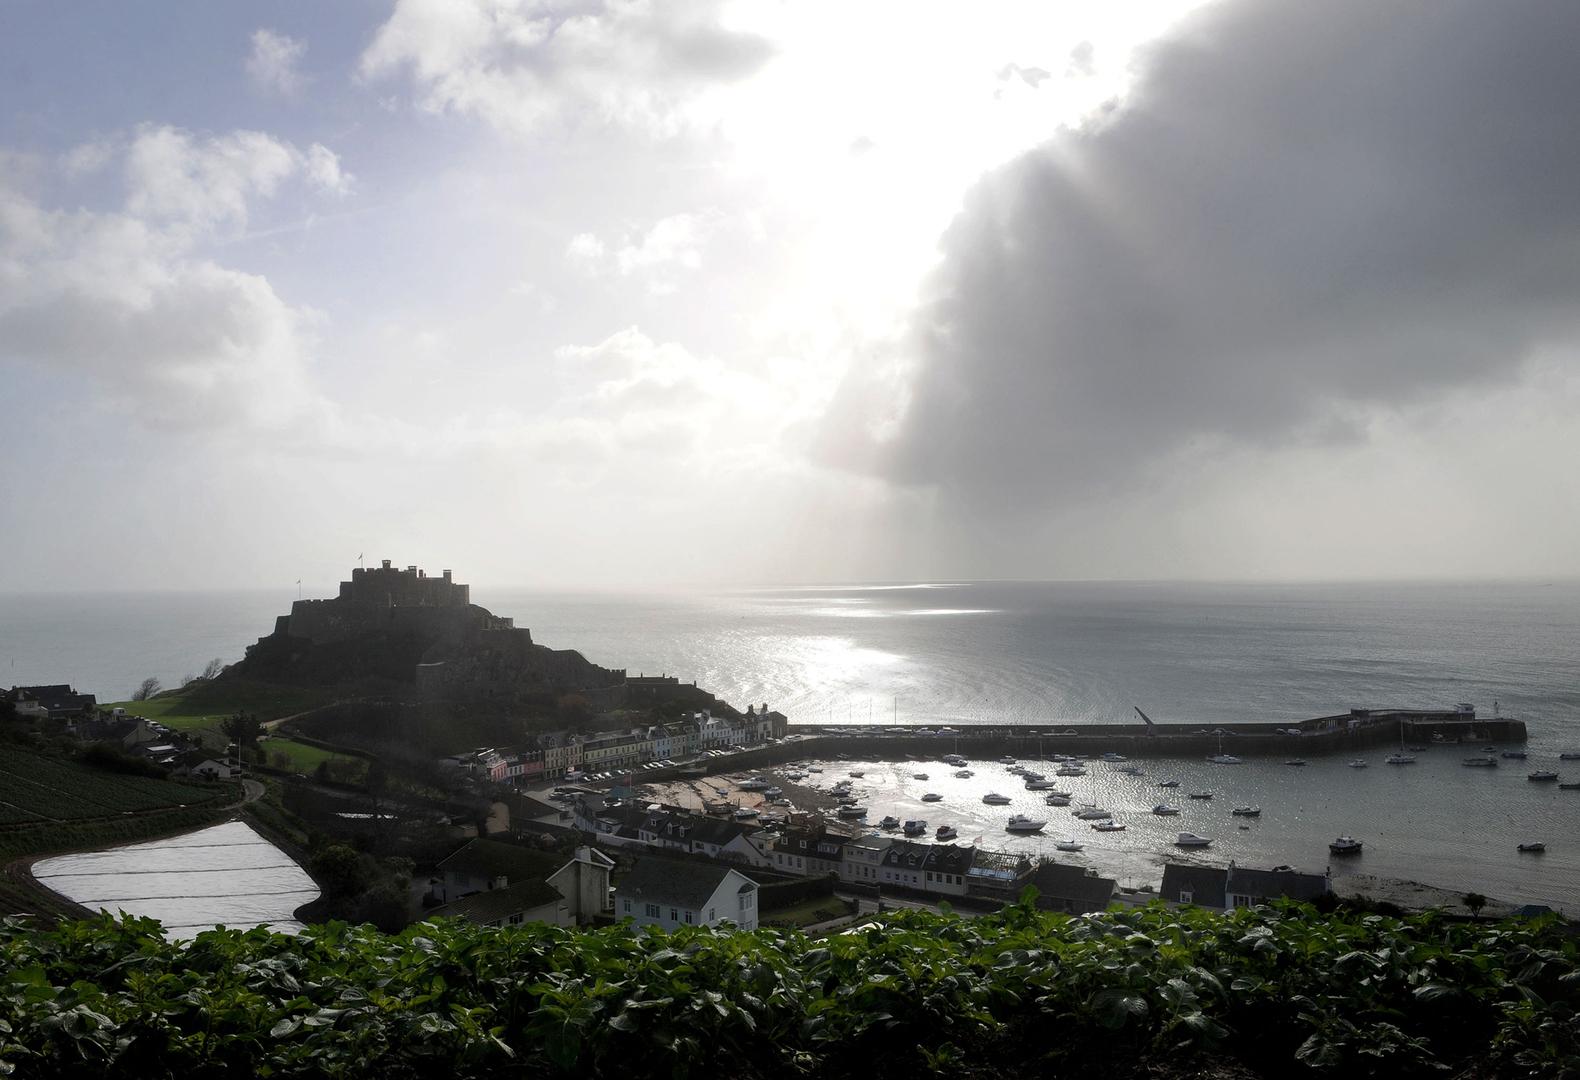 جزيرة جيرسي